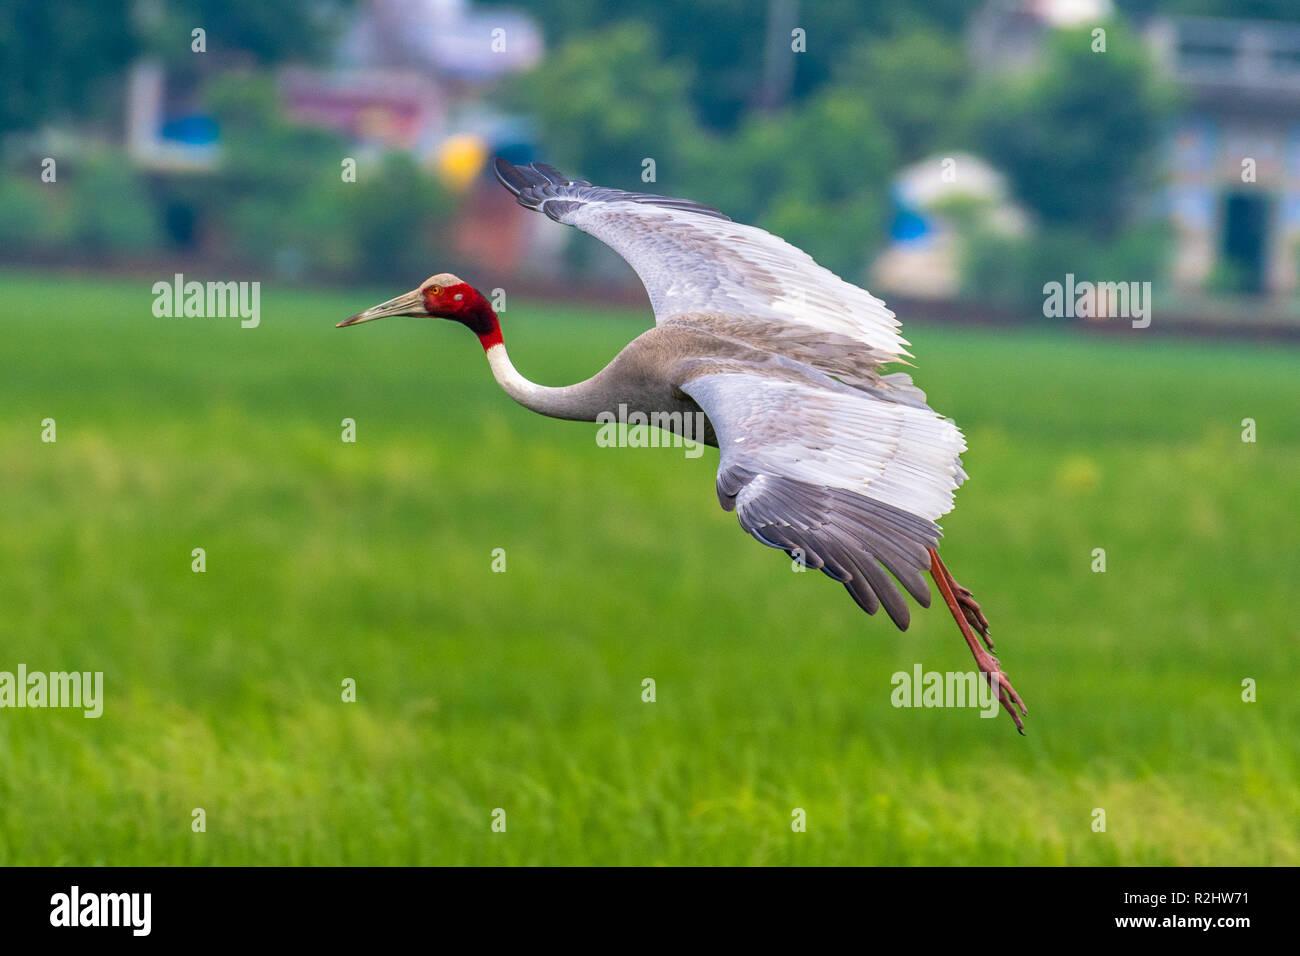 Sarus crane - Stock Image